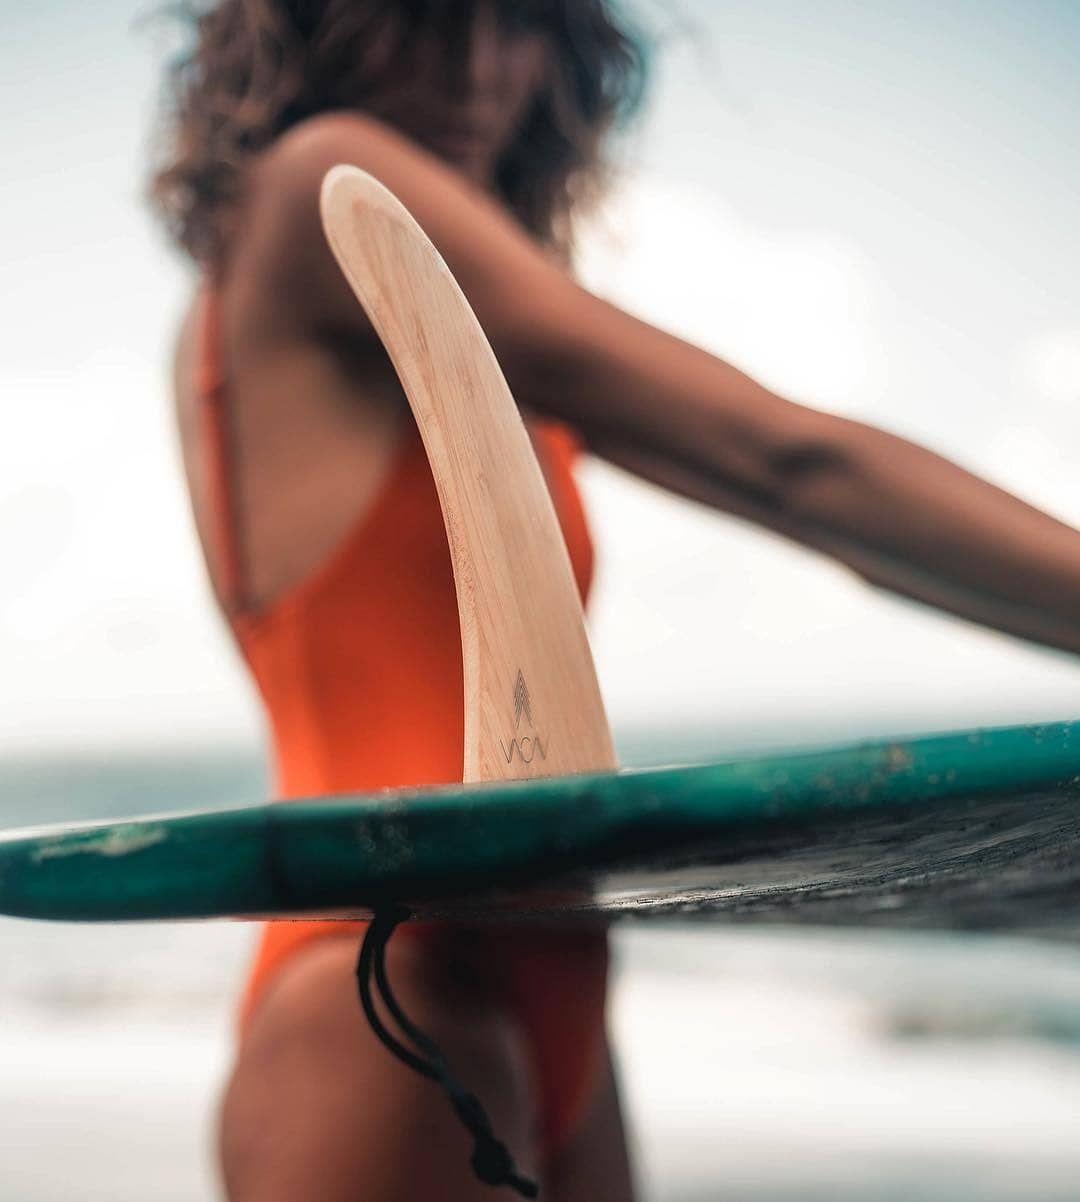 "Immersion surf magazine on Instagram: ""M A D E  O F  W O O D . @_mcella_"